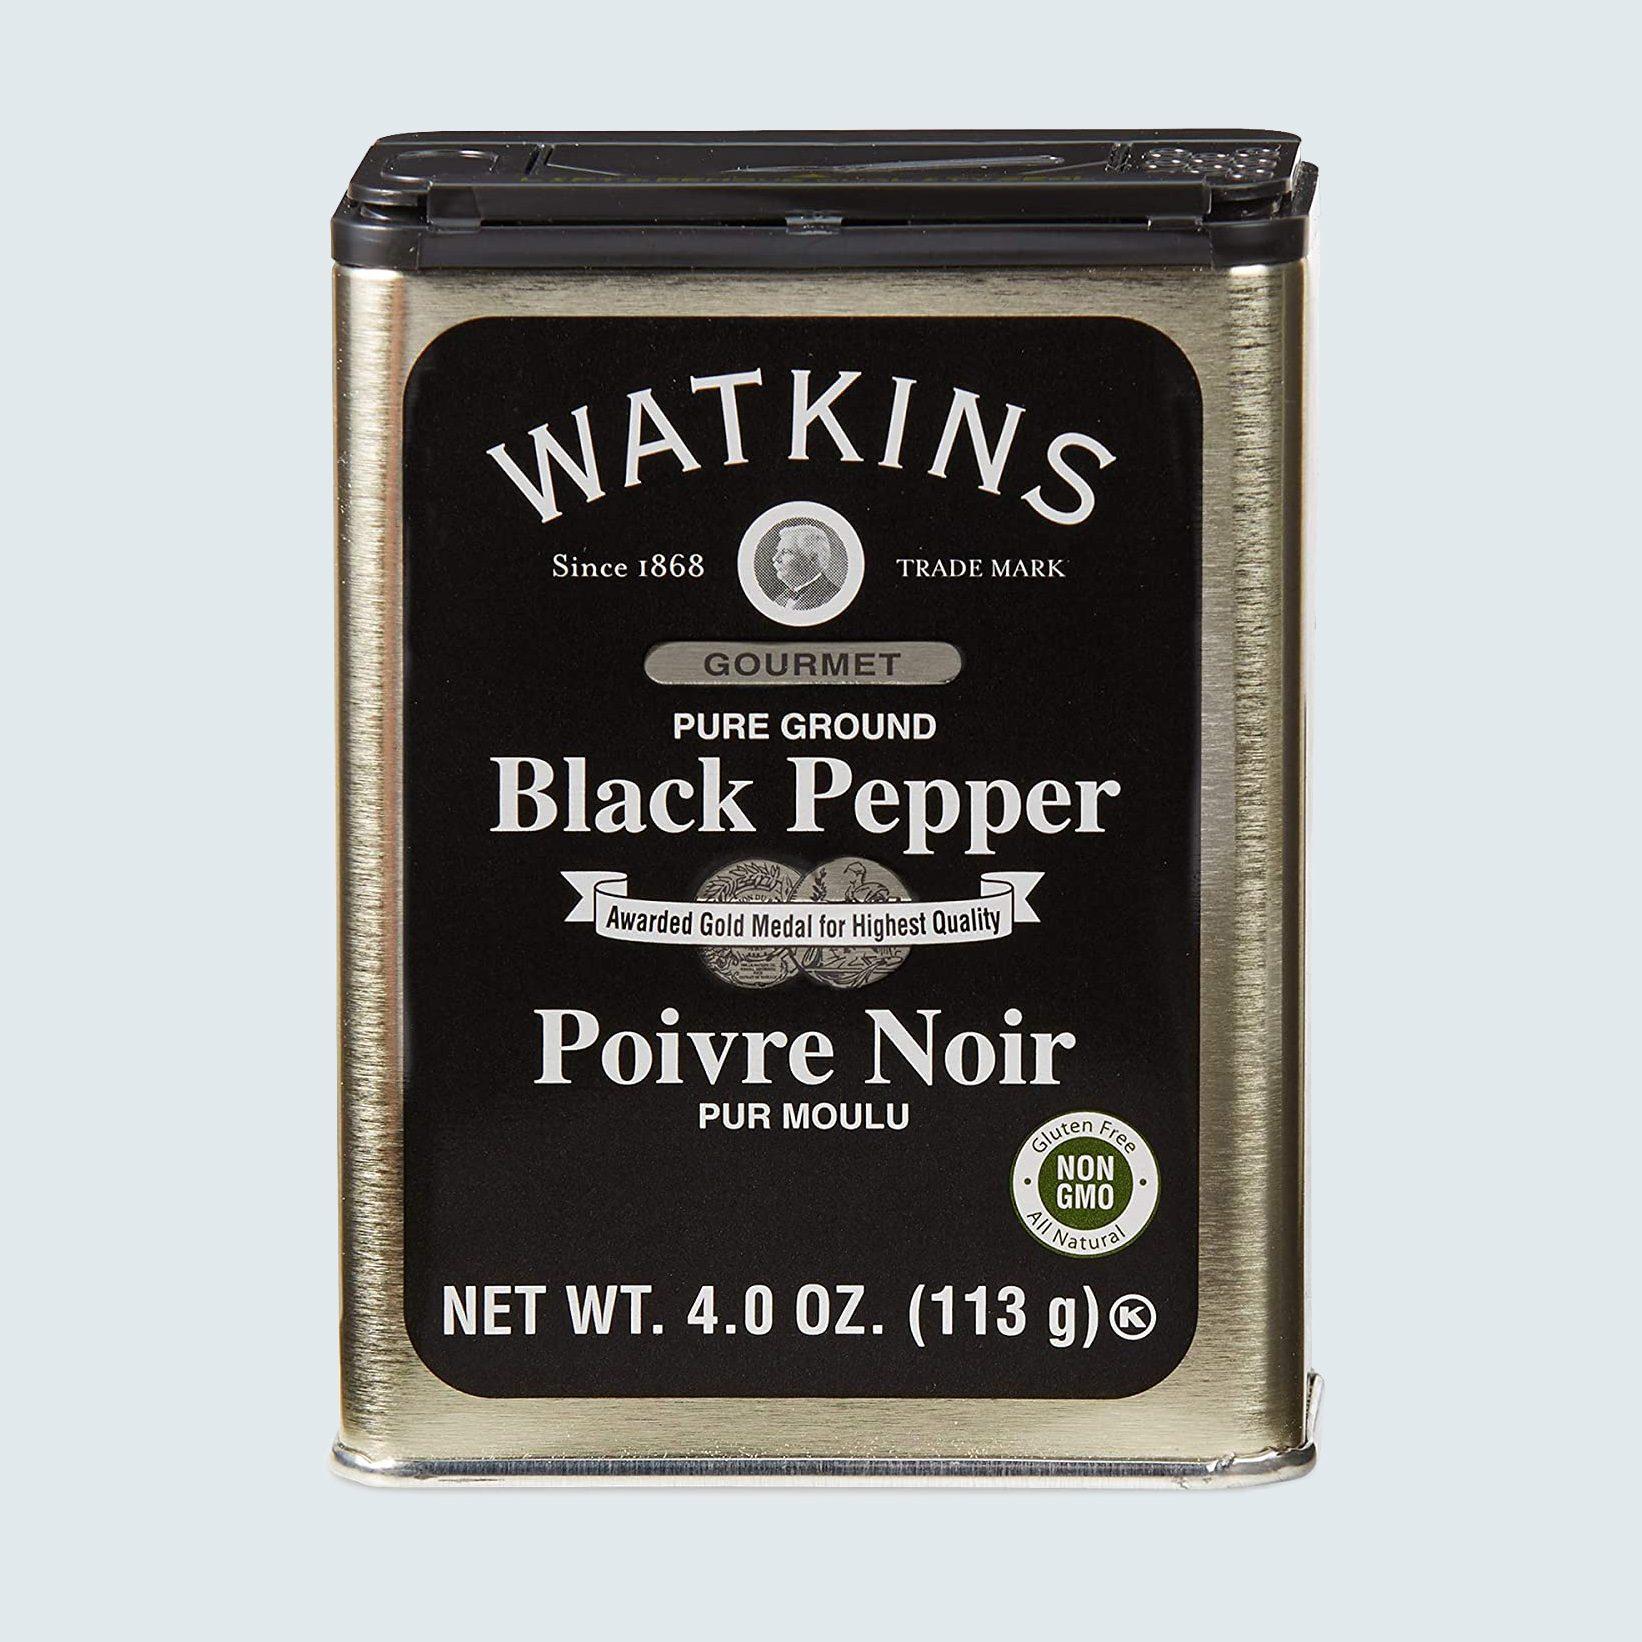 Watkins Gourmet Pure Ground Black Pepper